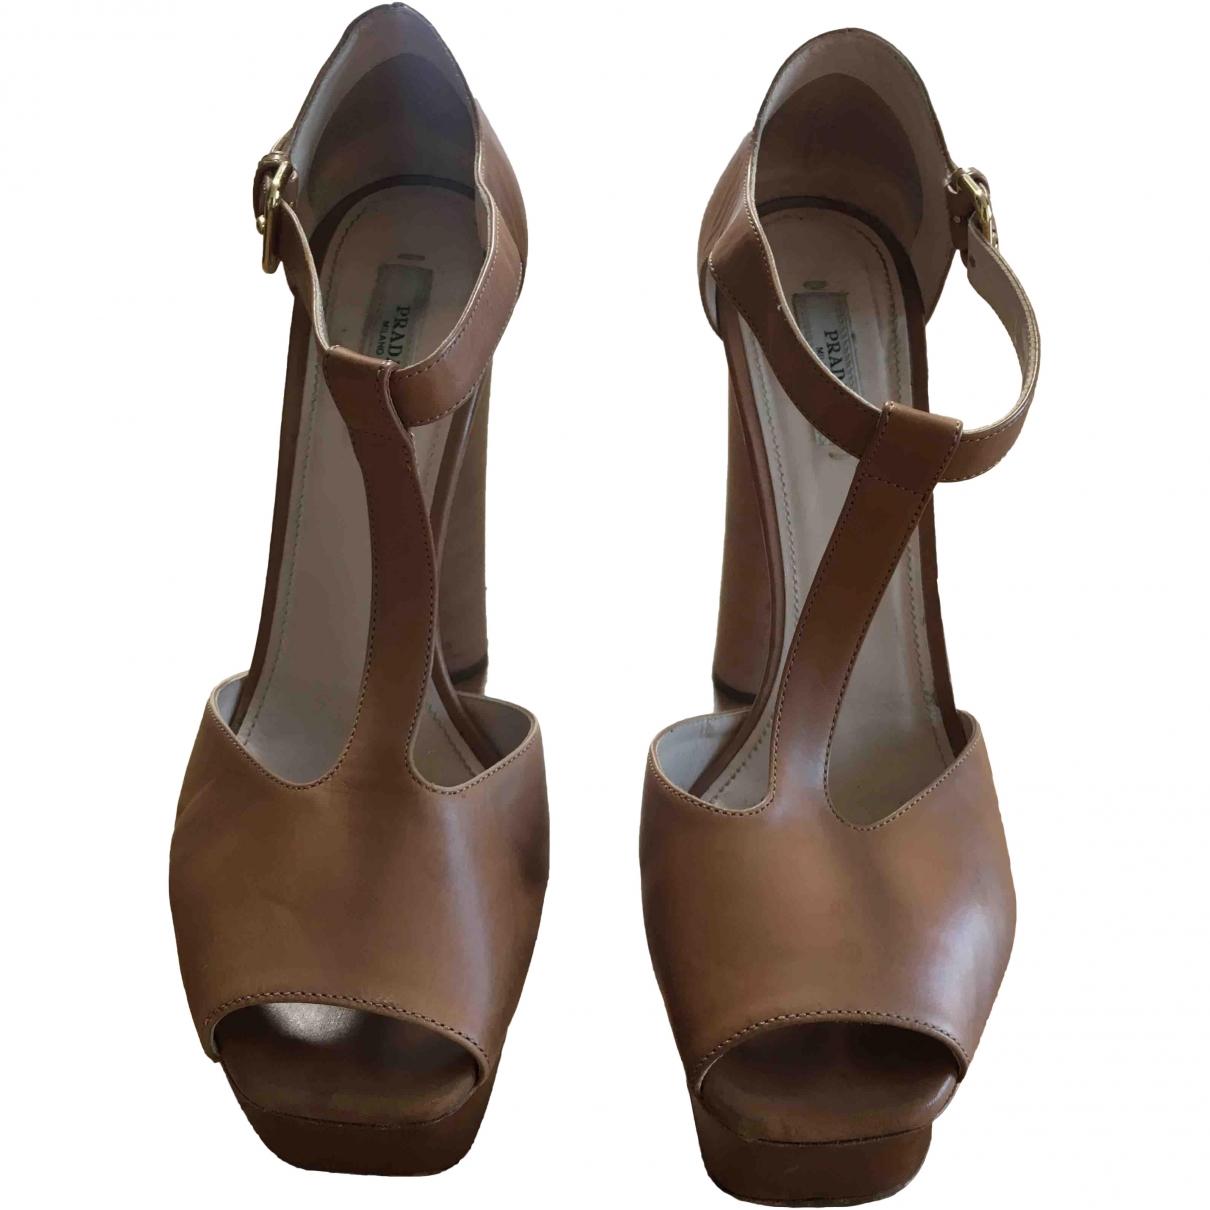 Prada \N Beige Leather Sandals for Women 40.5 EU